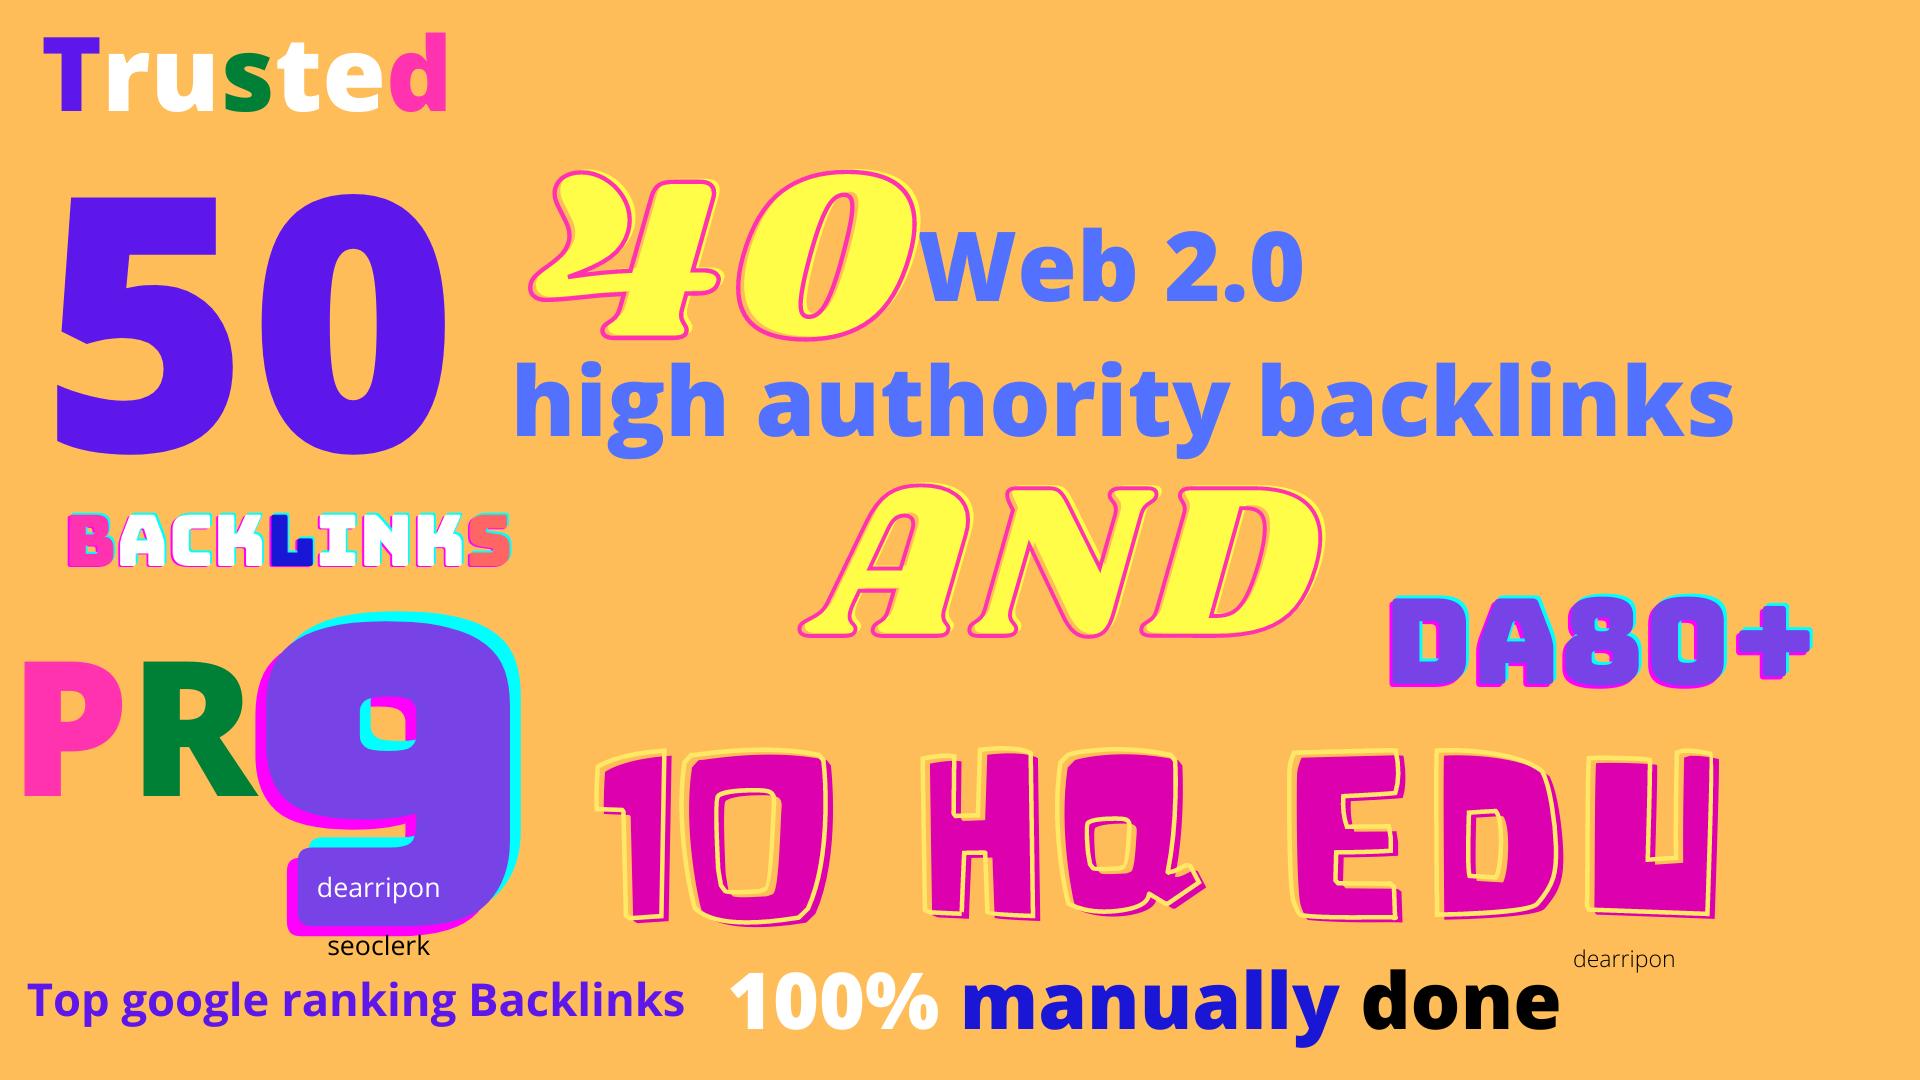 High Authority Da80+40 Web 2.0 AND 10 Edu Backlinks Permanent Manual Contextual Link Building